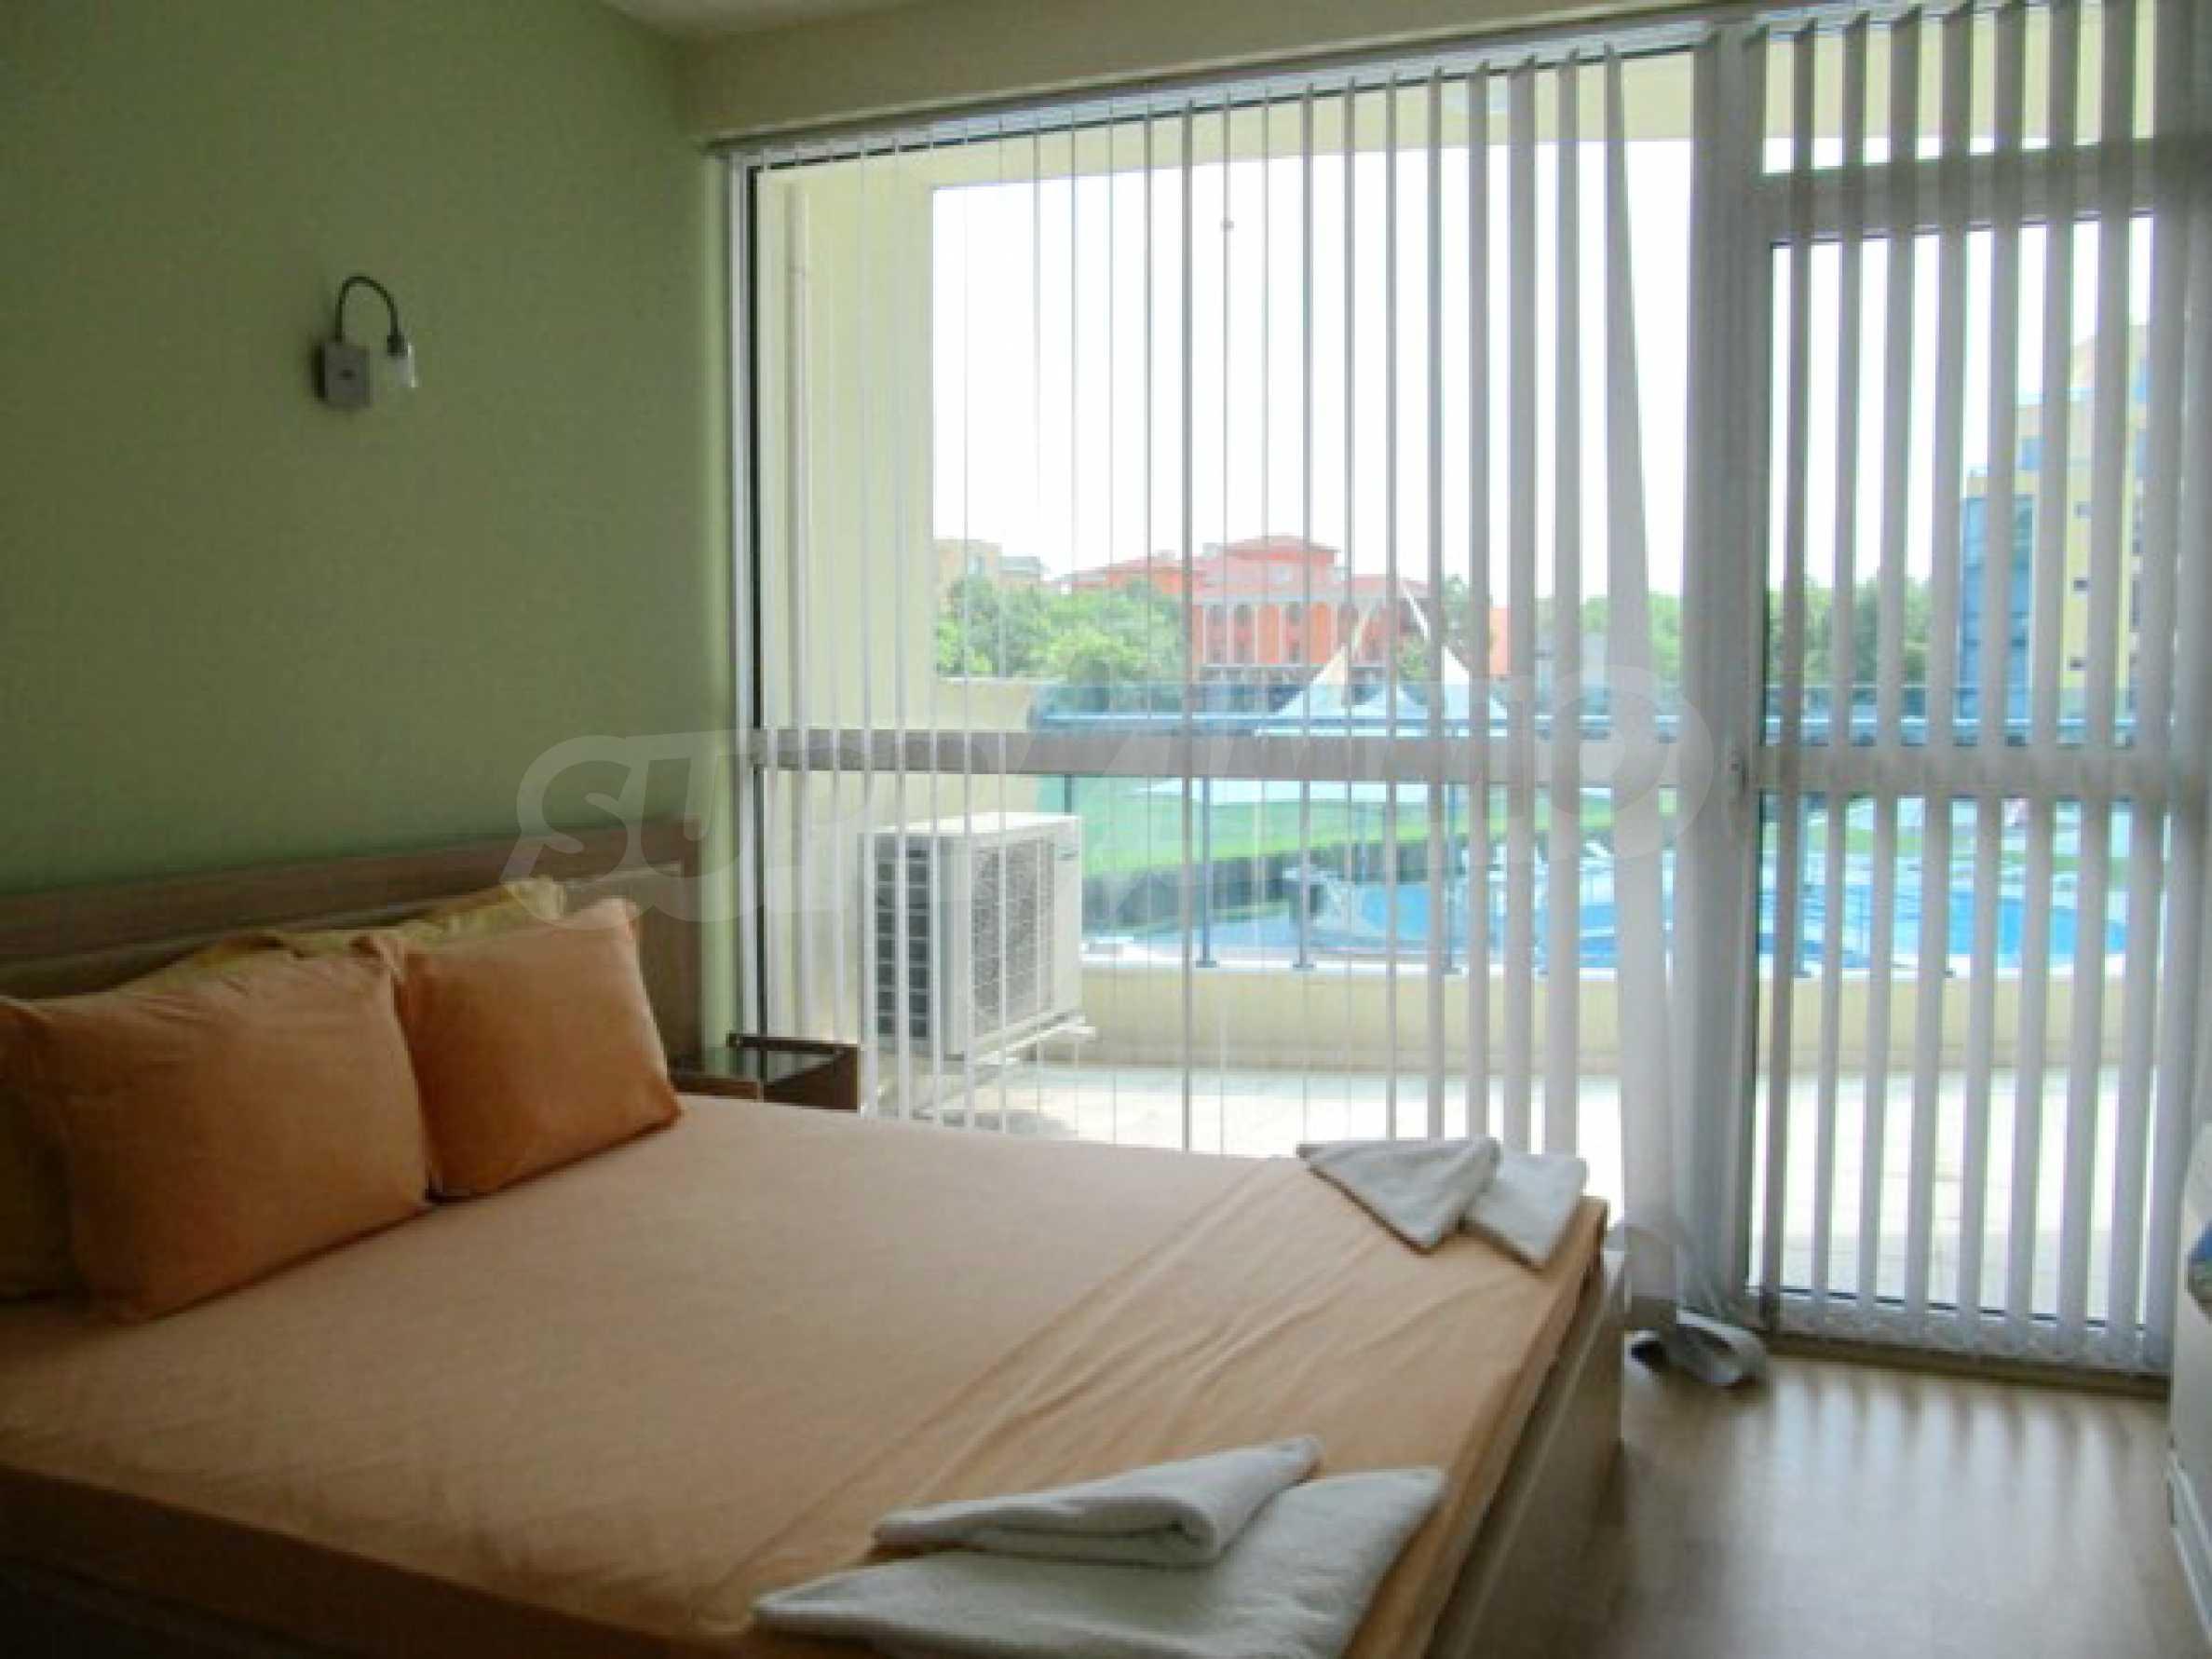 Тристаен апартамент за продажба в Поморие 13